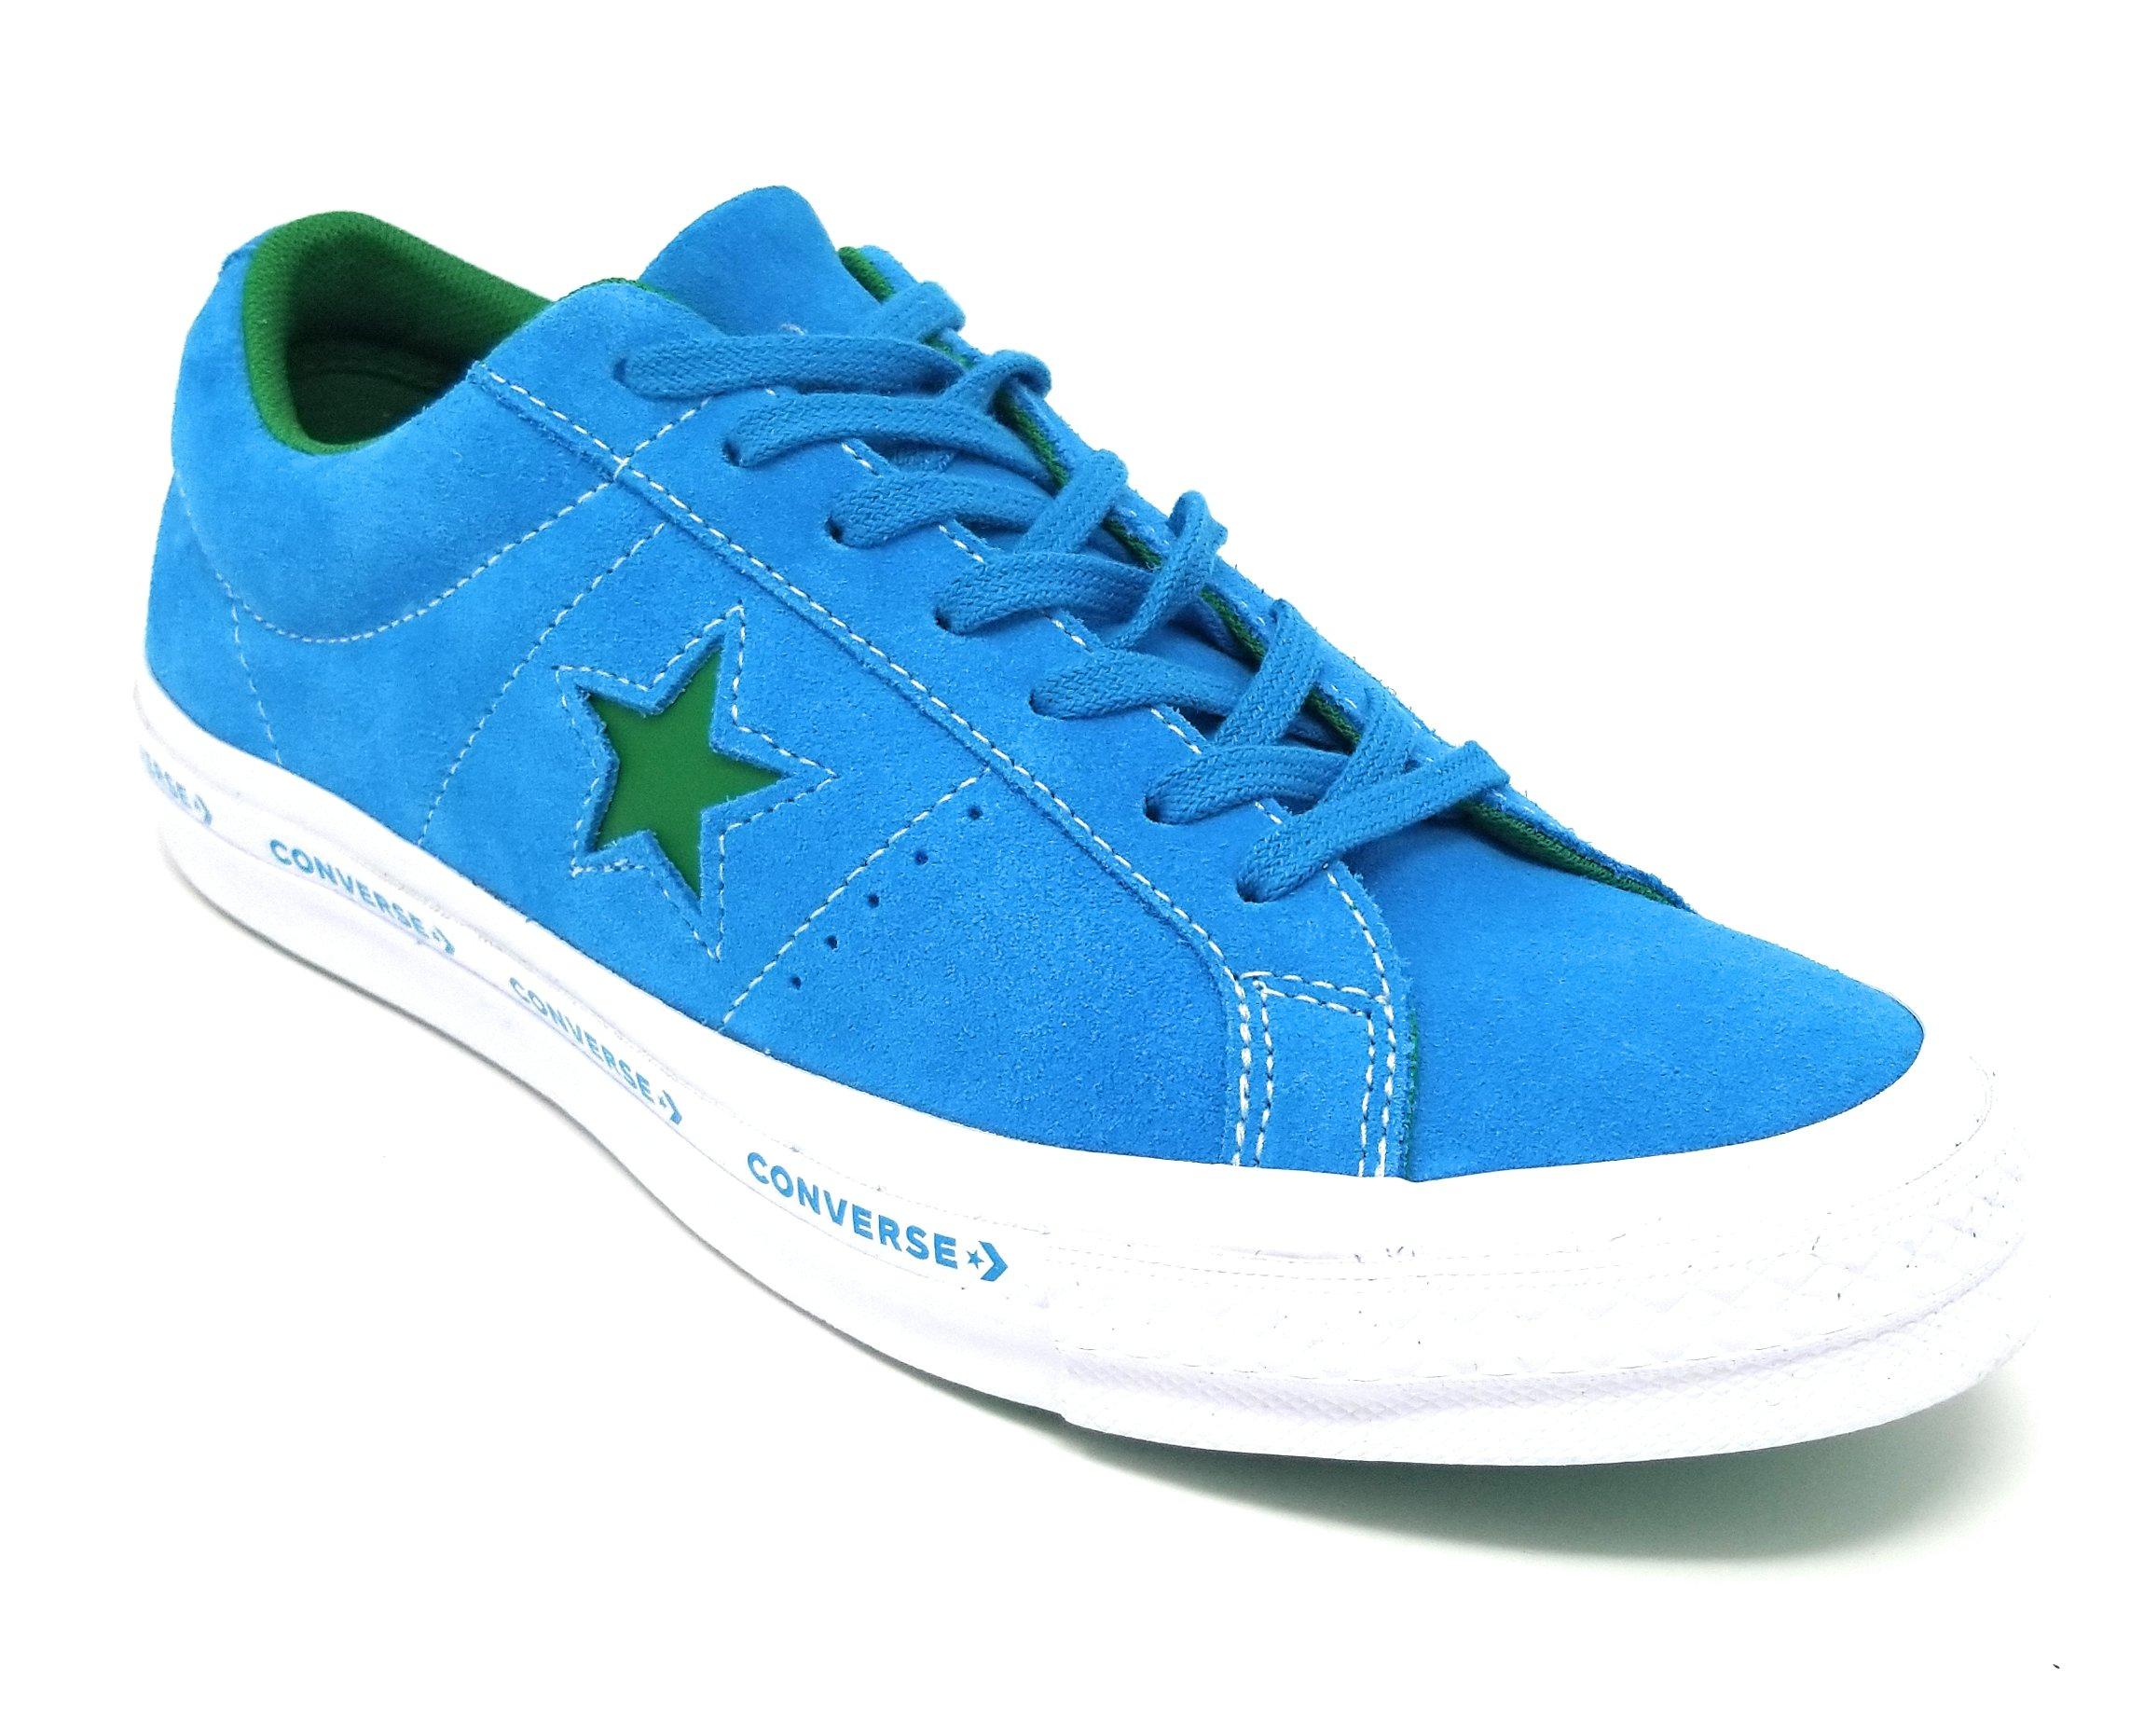 acea3678f866 Galleon - Converse One Star OX Premium Suede Fashion Sneaker (13 D ...